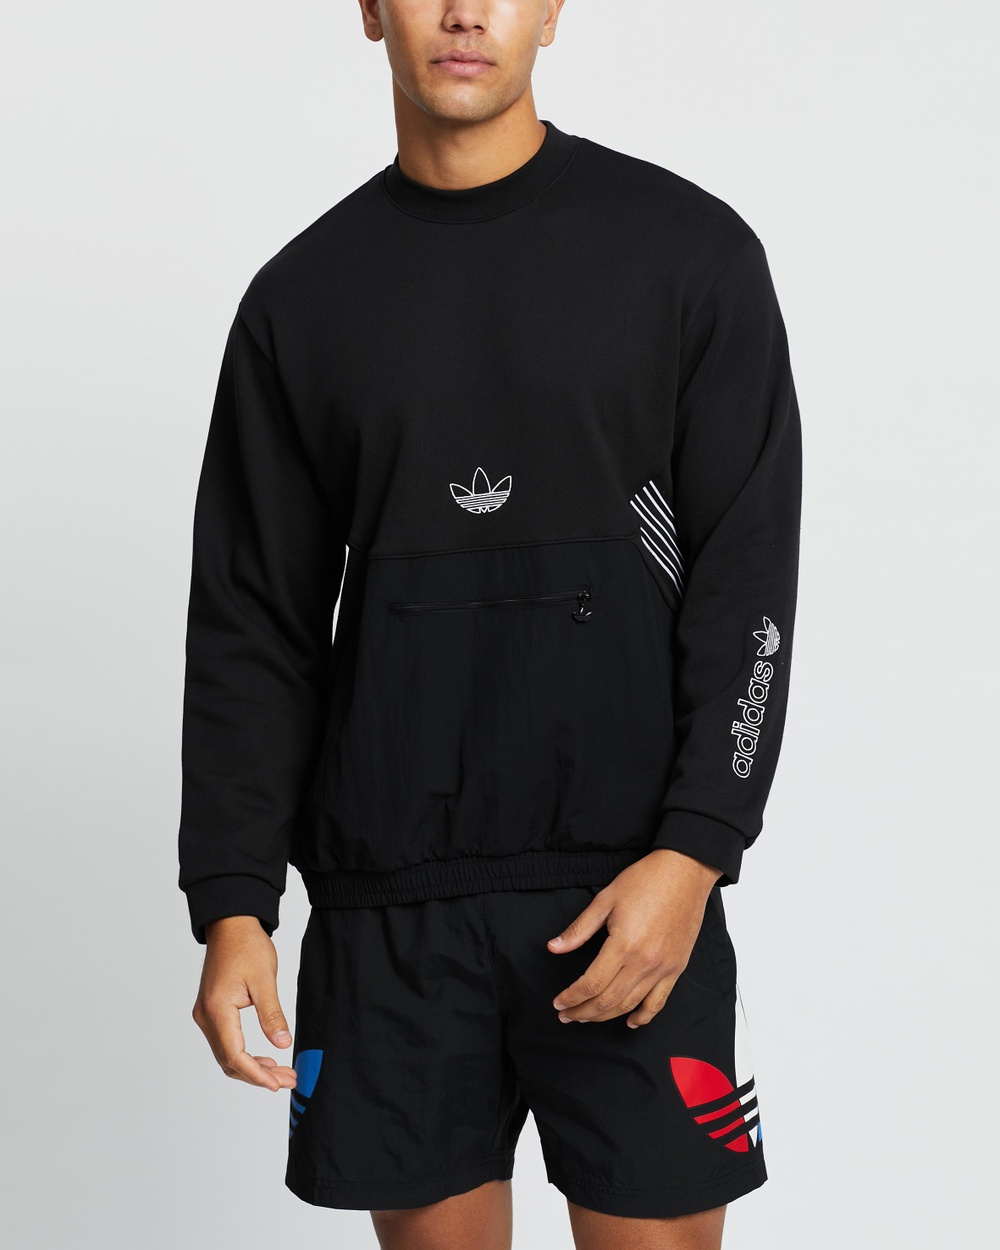 adidas Originals SPRT Archive Crew Sweatshirt Necks Black